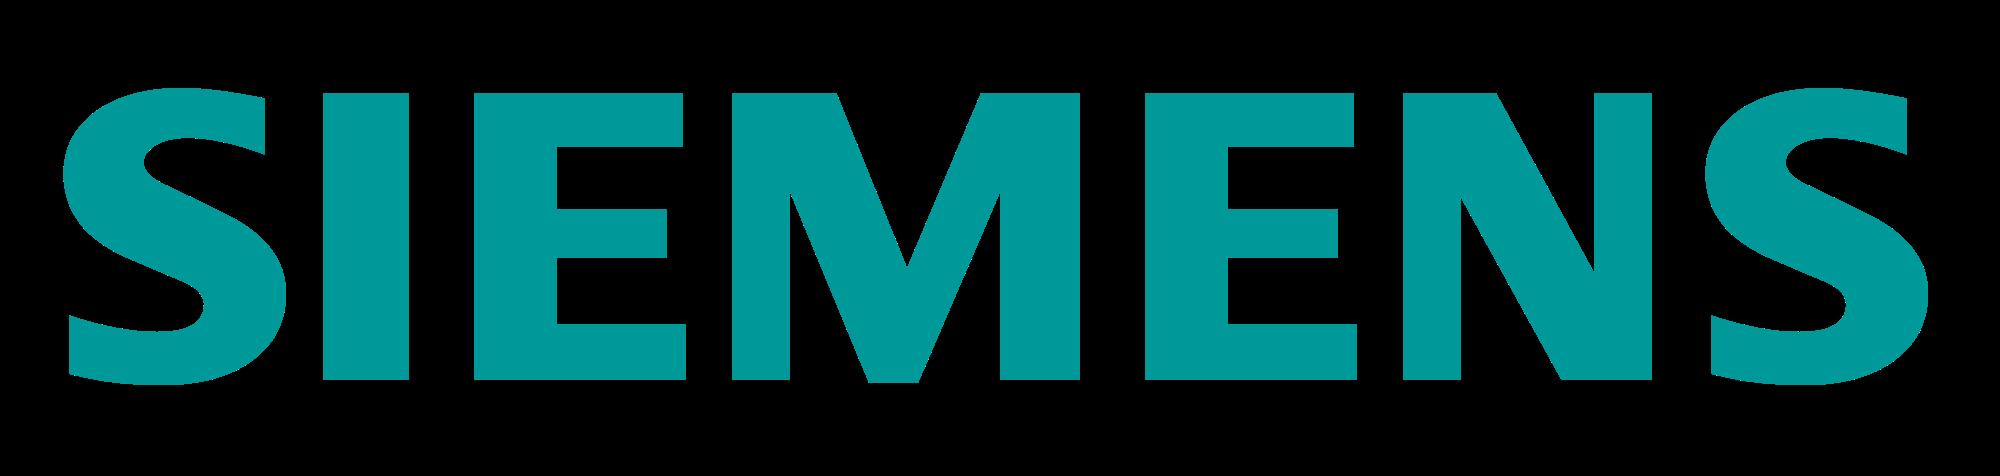 Siemens PLM logo